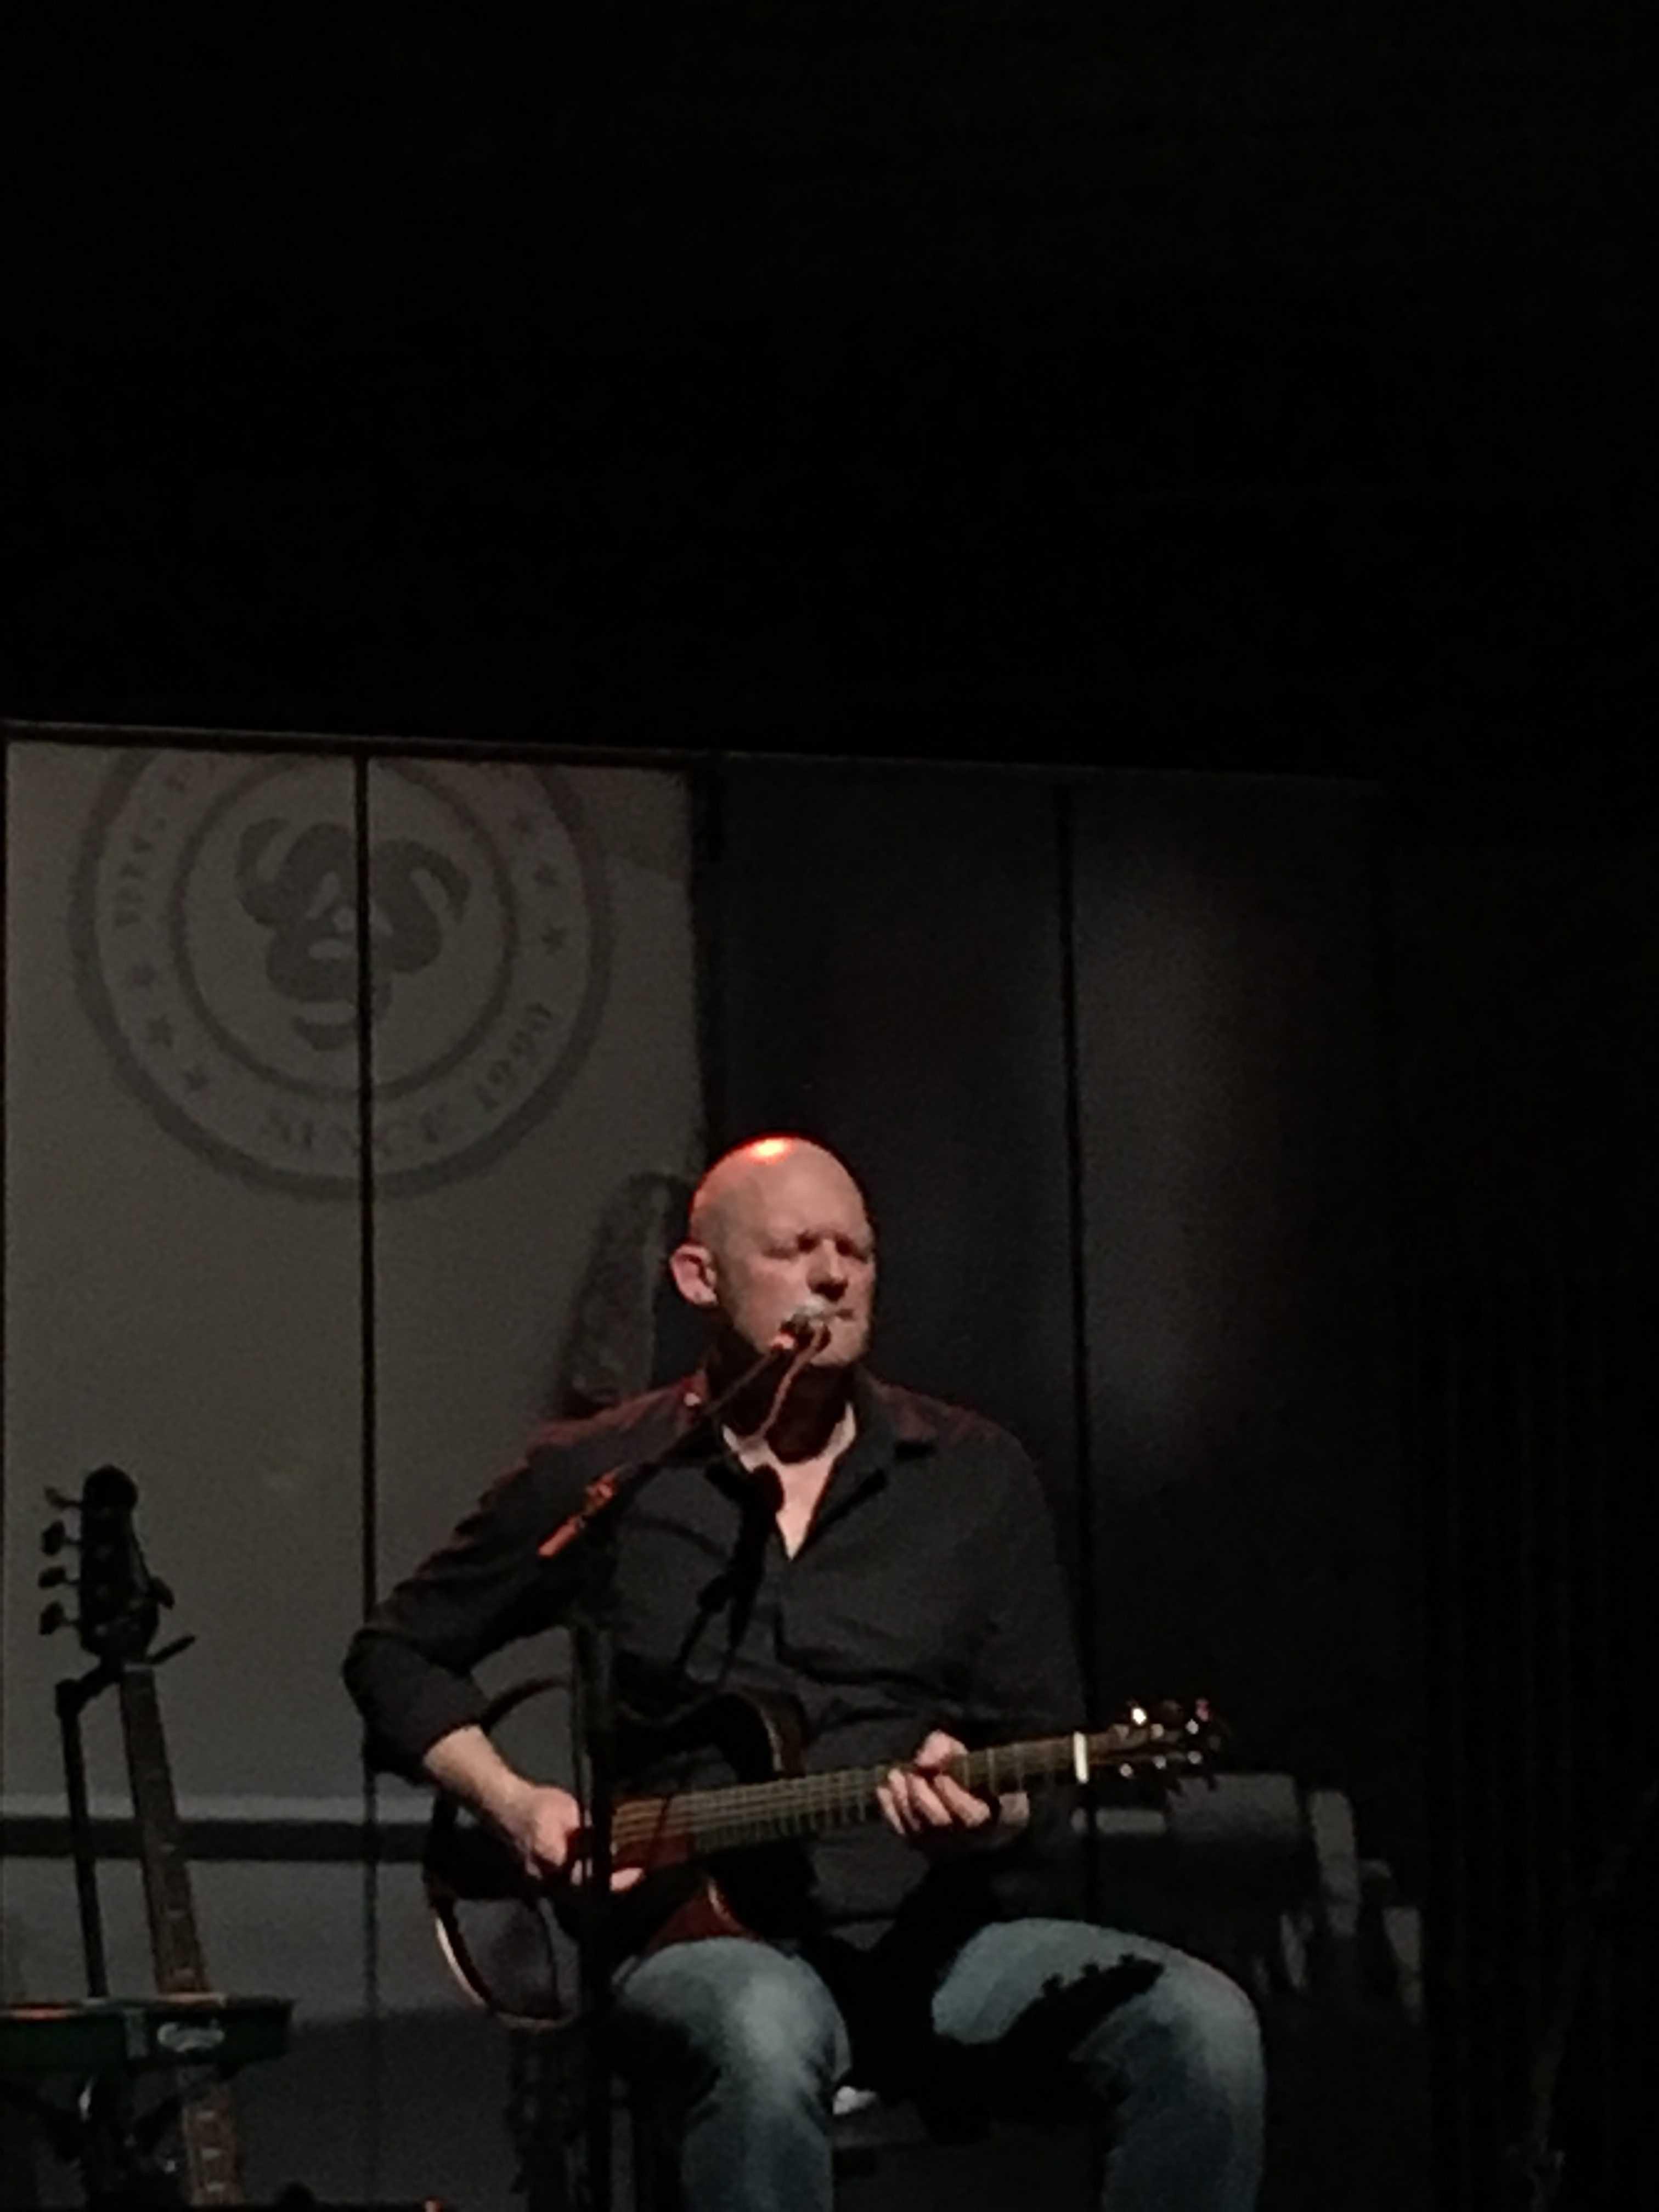 Guitarist Asger Steenholdt